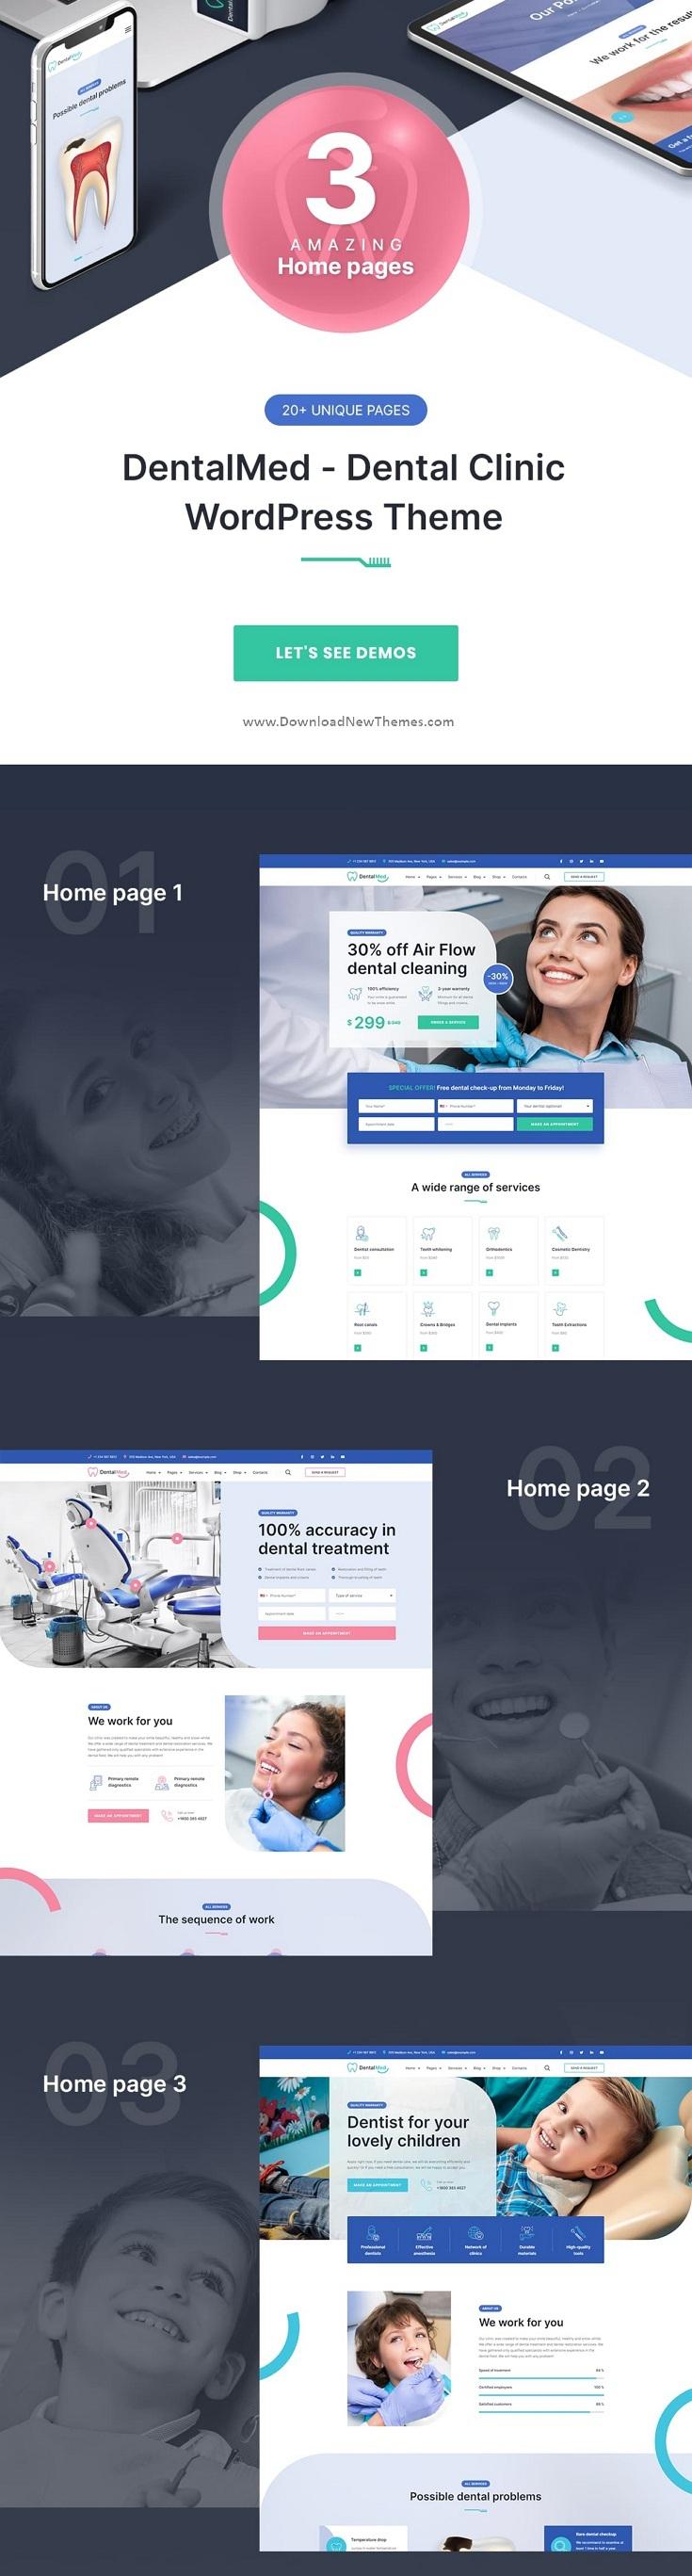 Dental and Dentist Clinic WordPress Theme